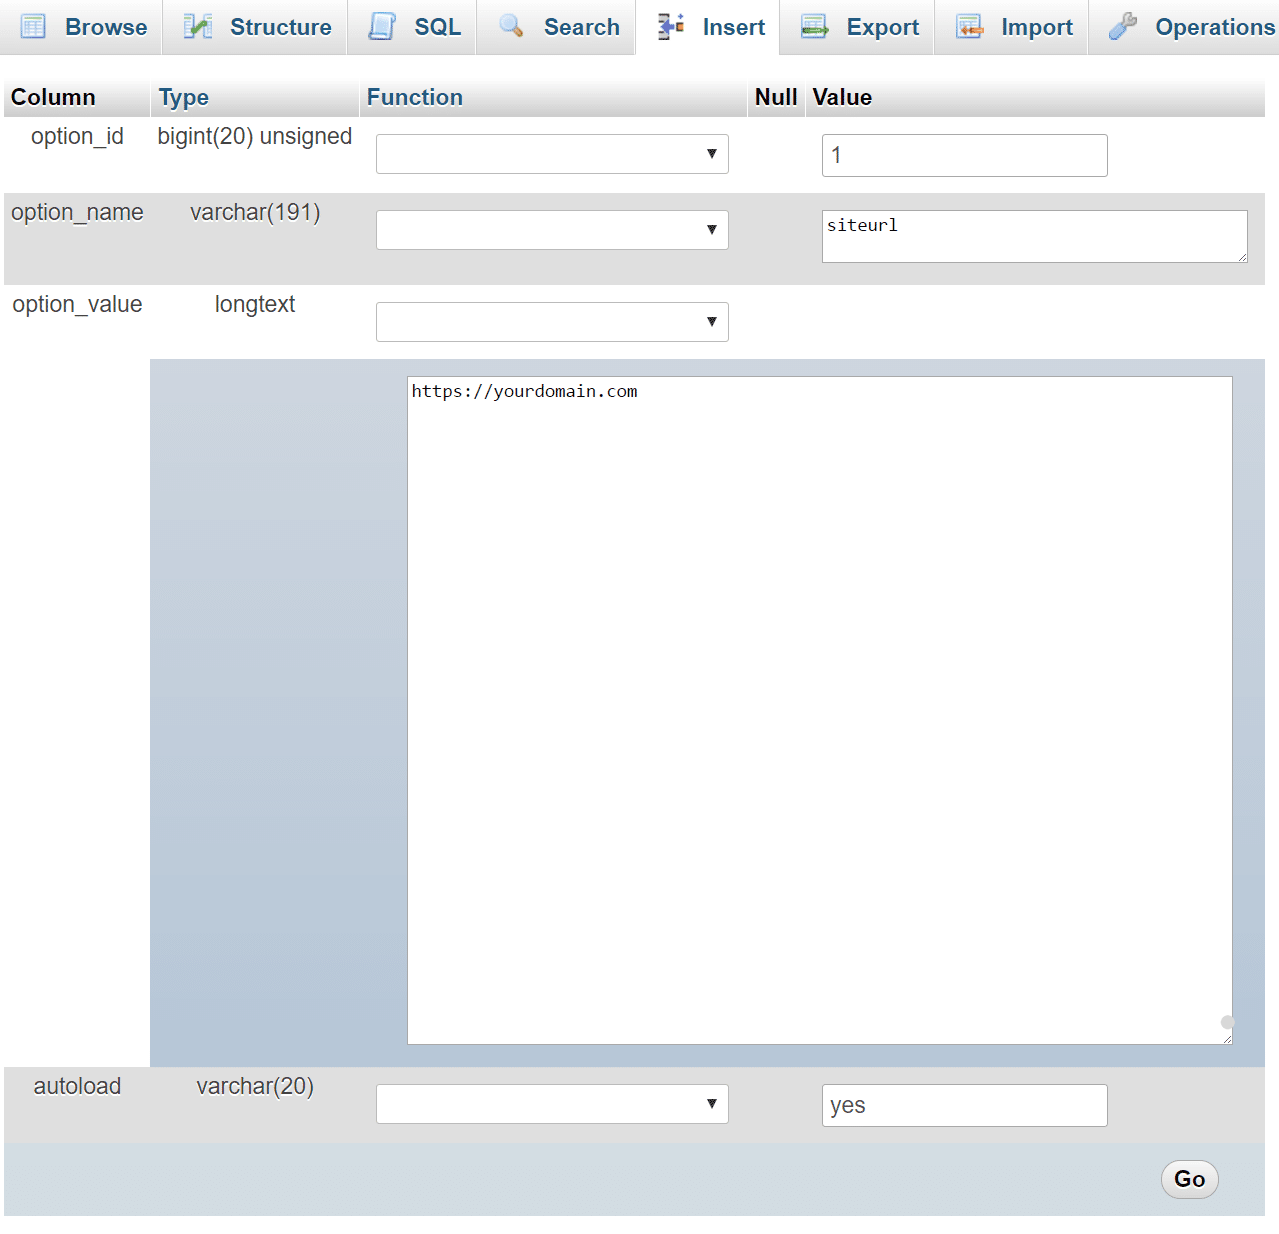 Editar o valor do siteurl